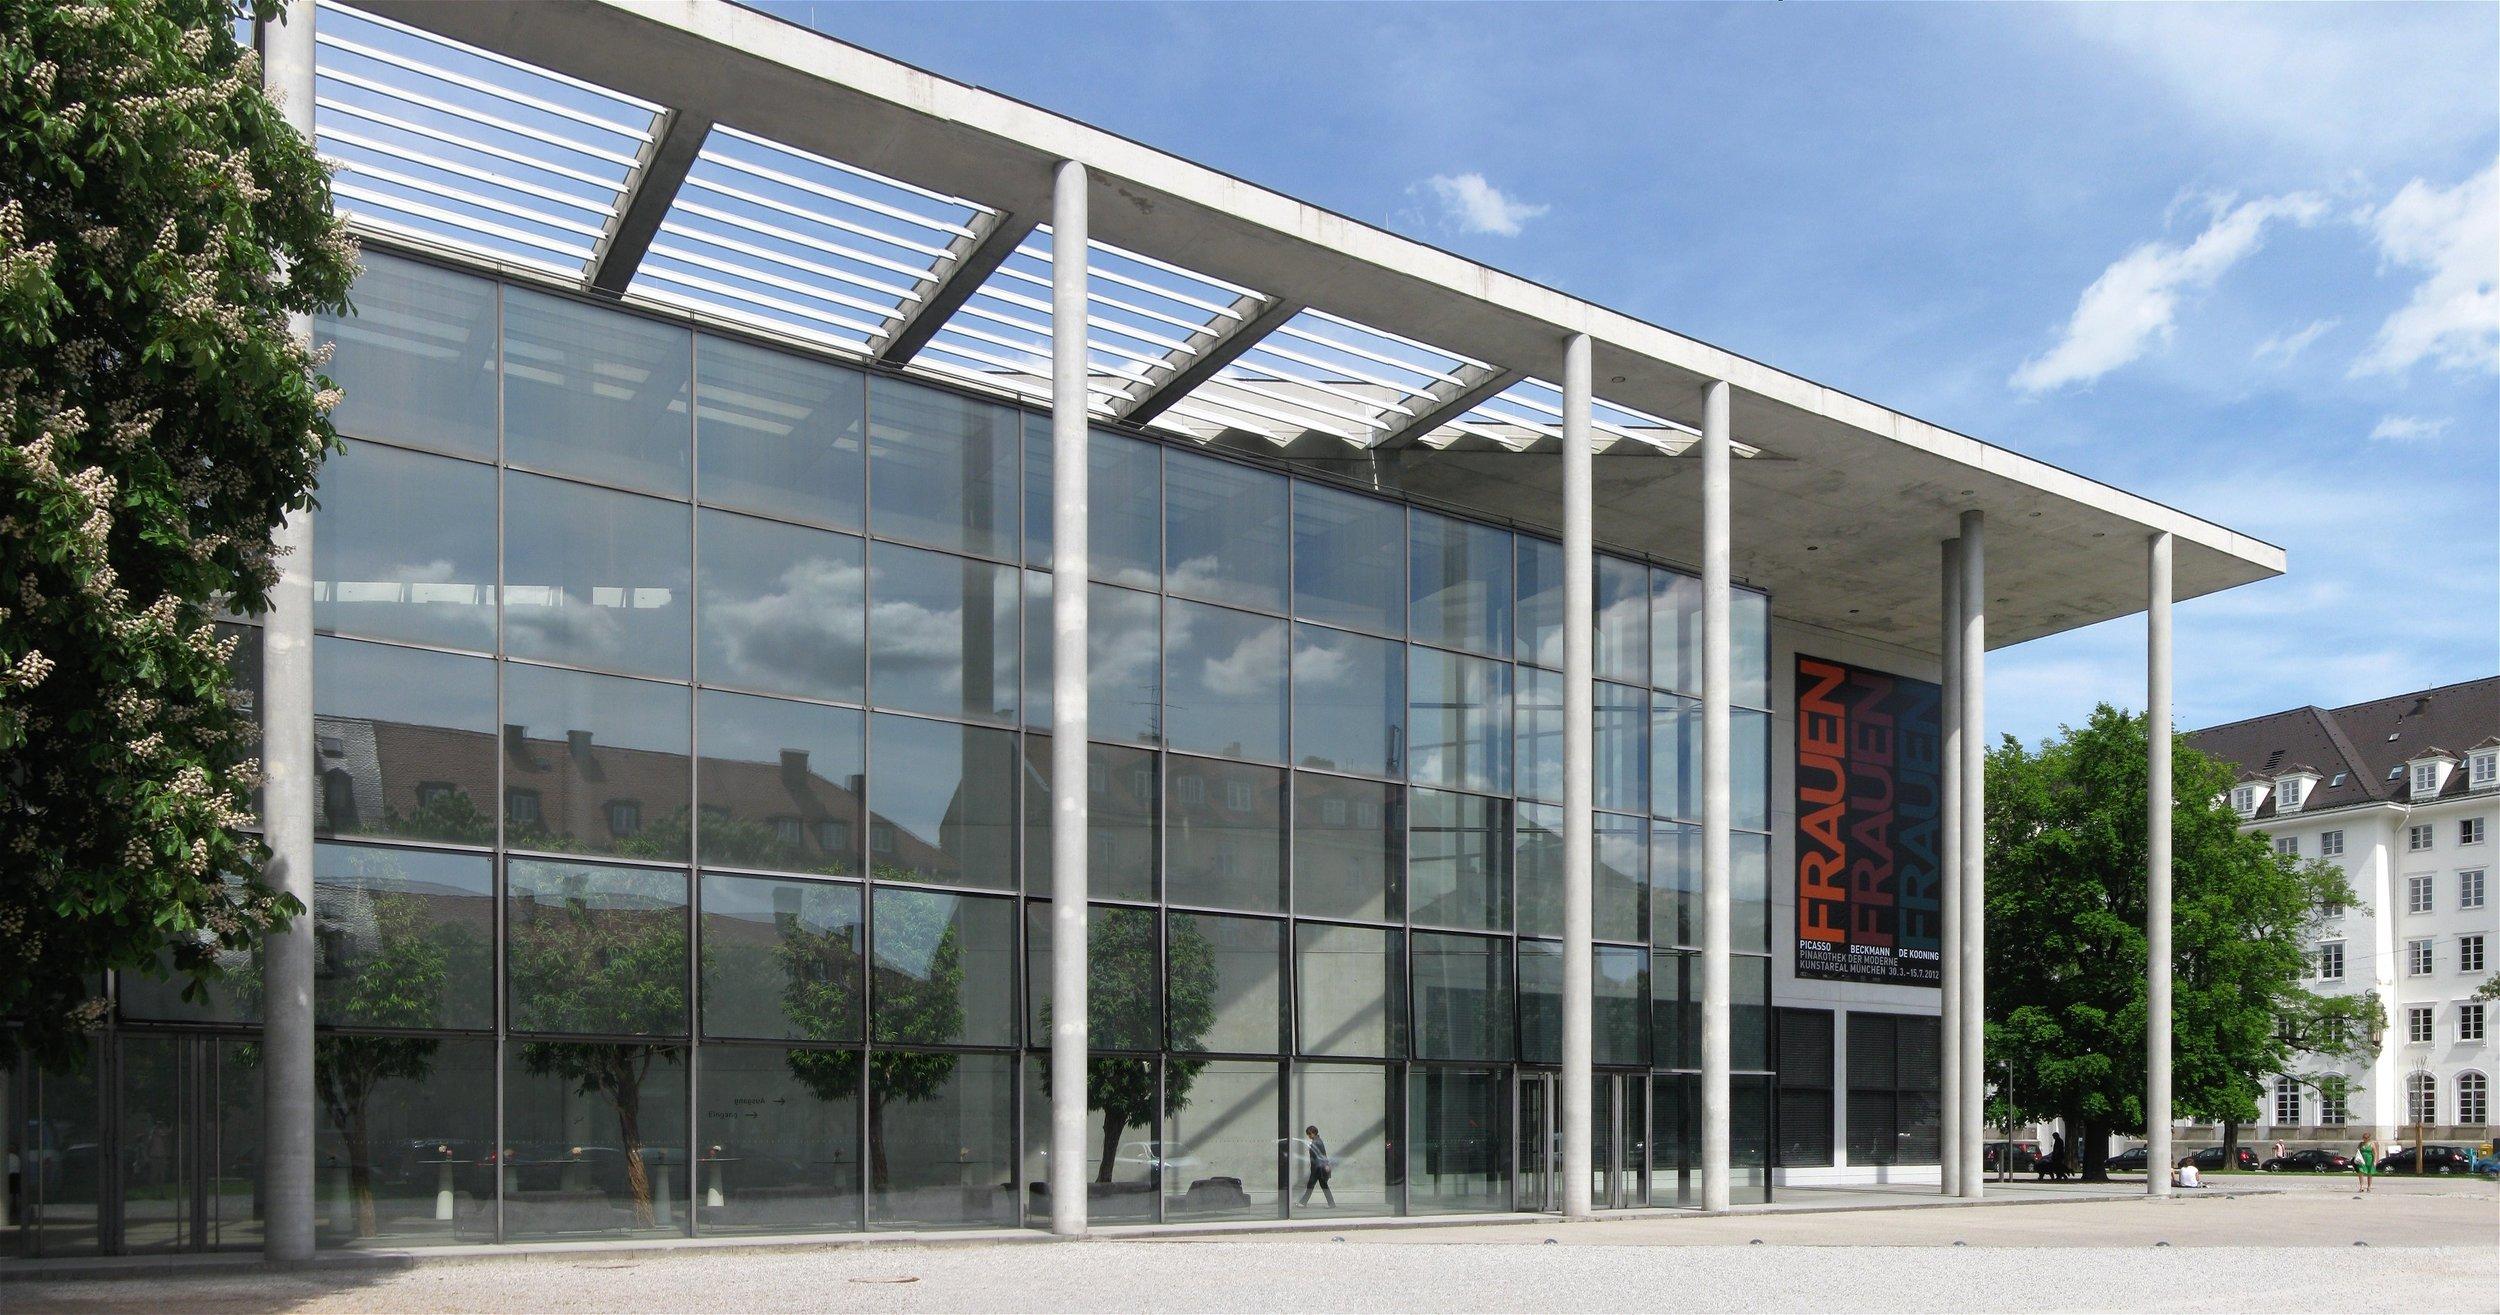 Rufus46 -  https://commons.wikimedia.org/wiki/File:Pinakothek_der_Moderne_Suedseite_Muenchen-1.jpg